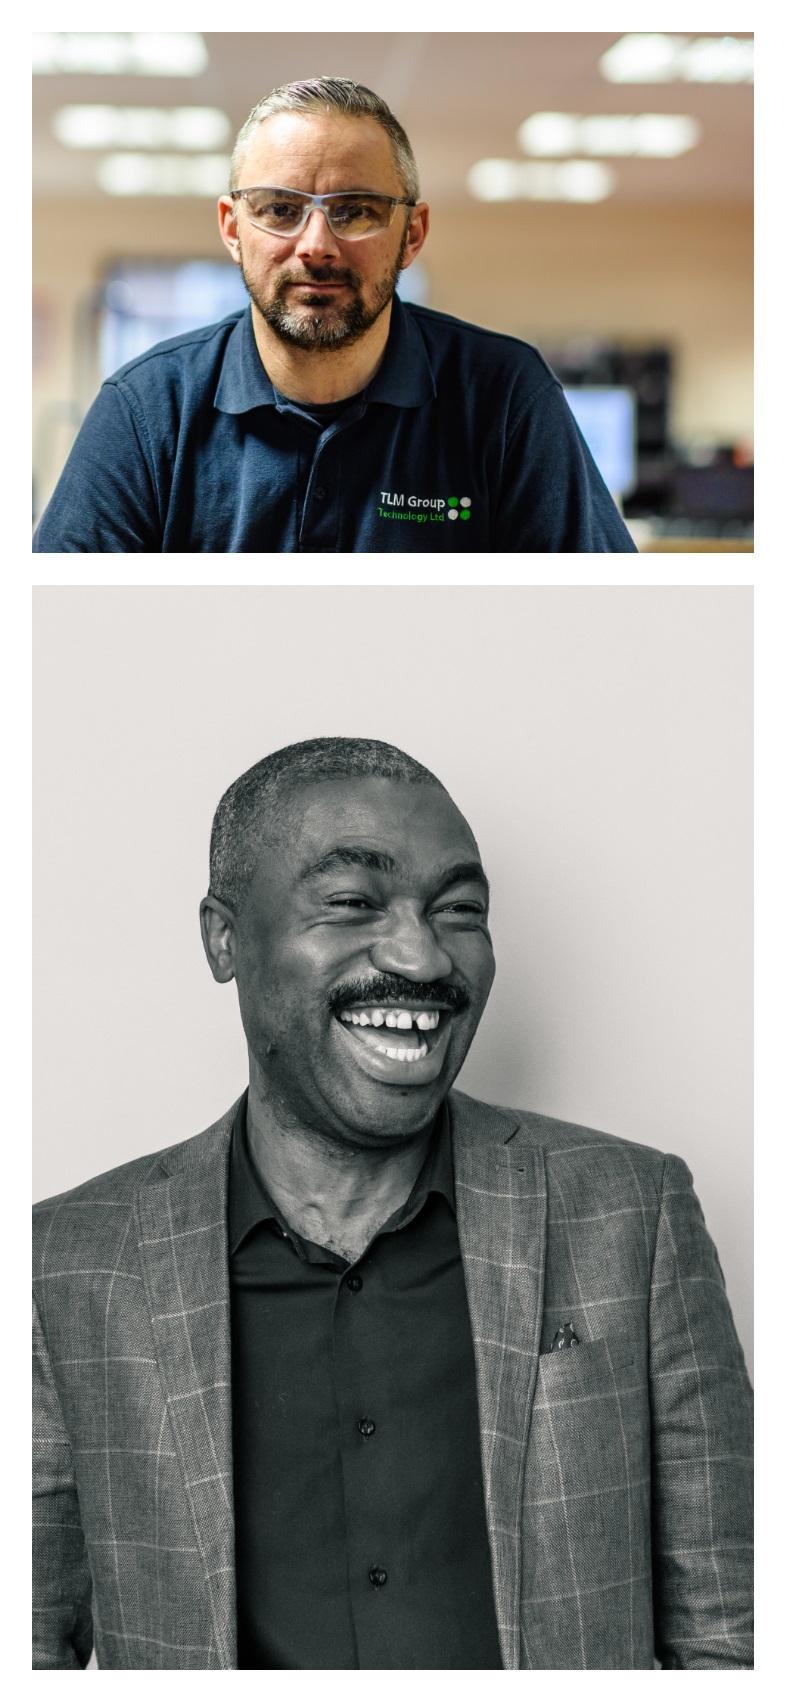 Business Head shots Portrait photography Birmingham Midlands Warwickshire UK by Chris Fossey 14